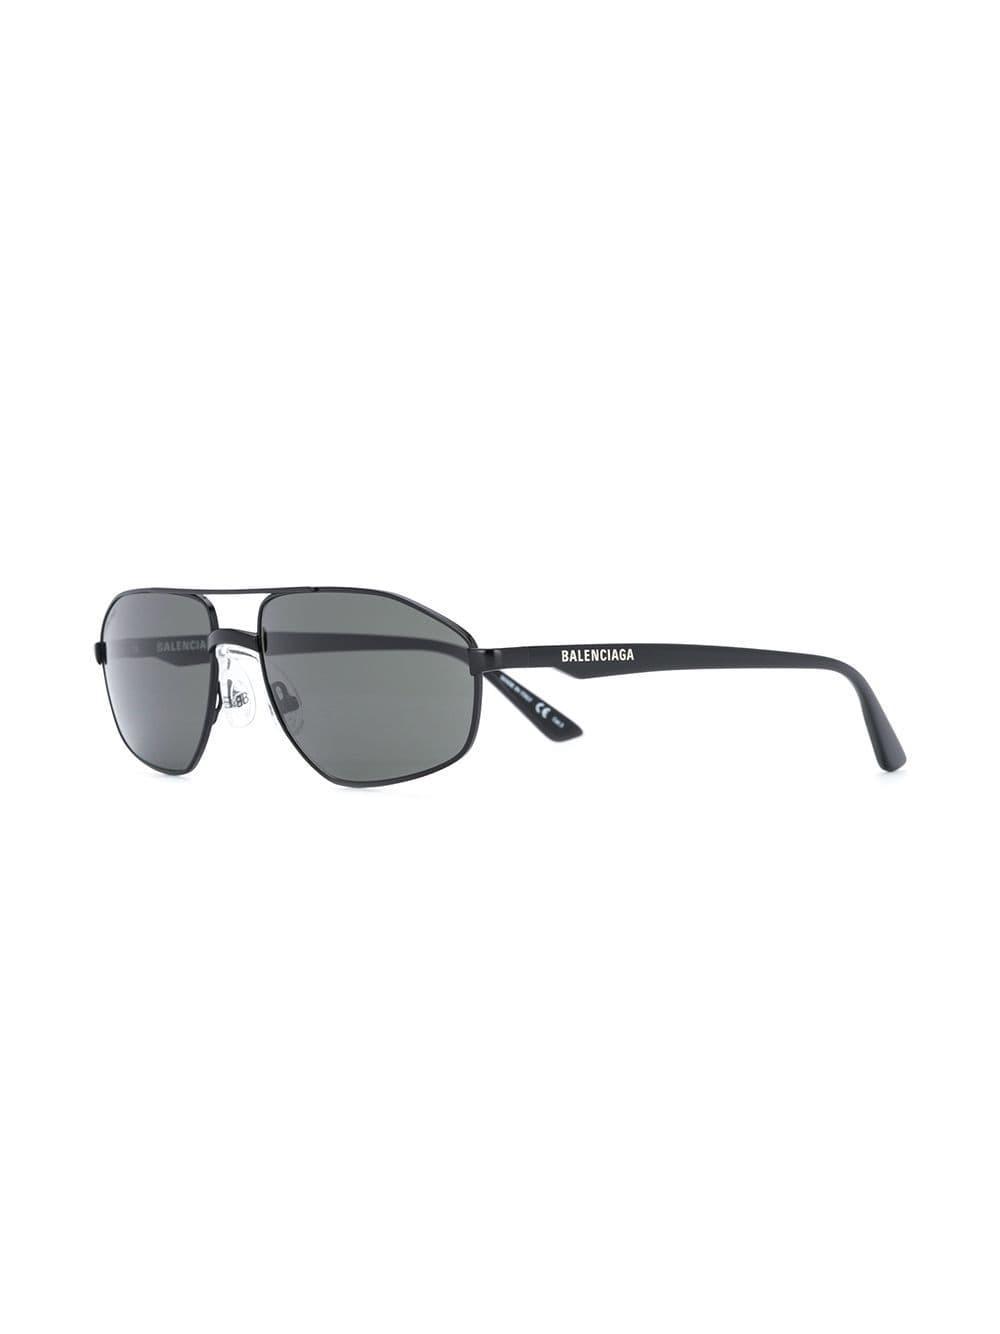 bc5572b49c6 Balenciaga - Black Top Bar Sunglasses for Men - Lyst. View fullscreen